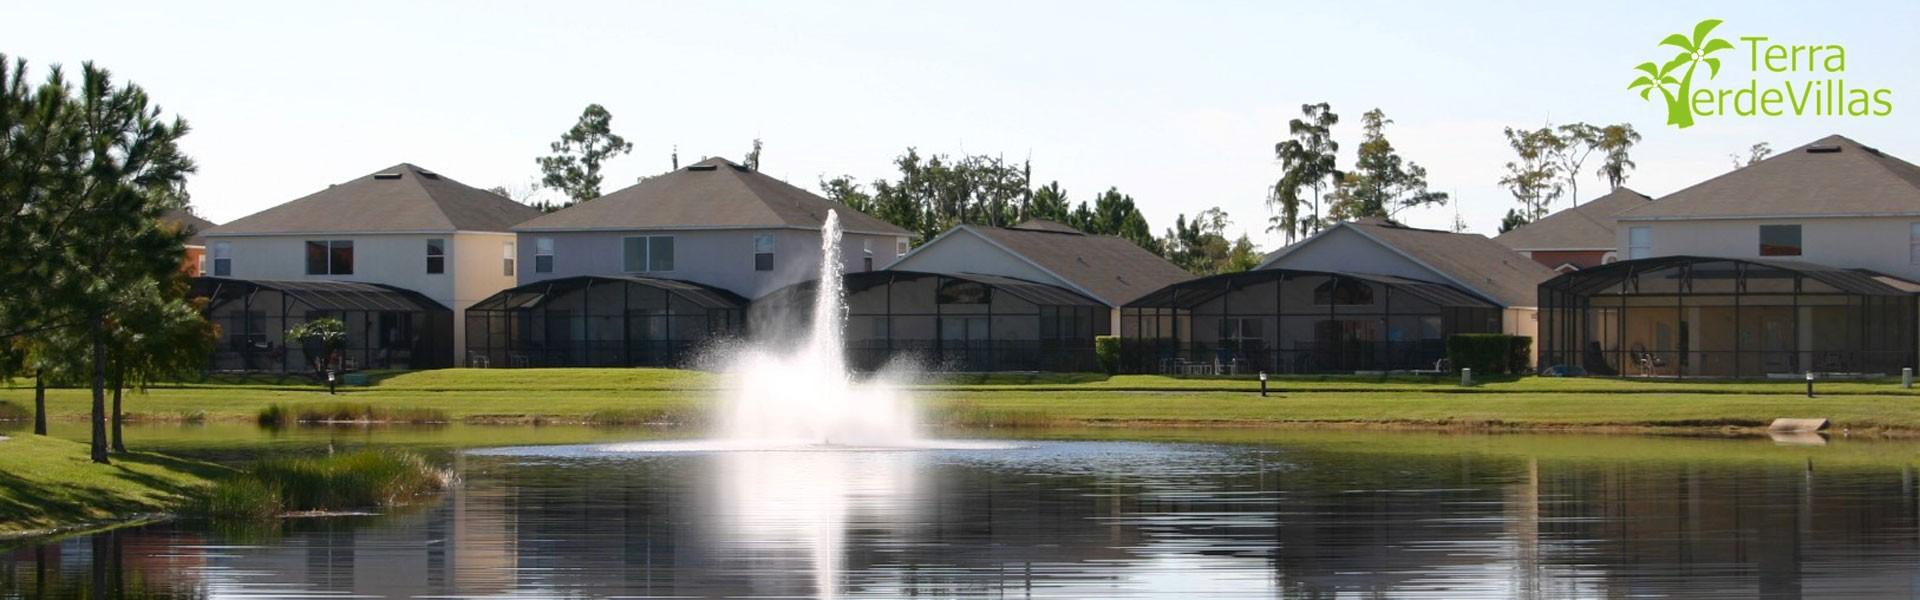 Terra Verde Resort   Villas   Disney   Orlando   Florida - Terra Verde Florida Map